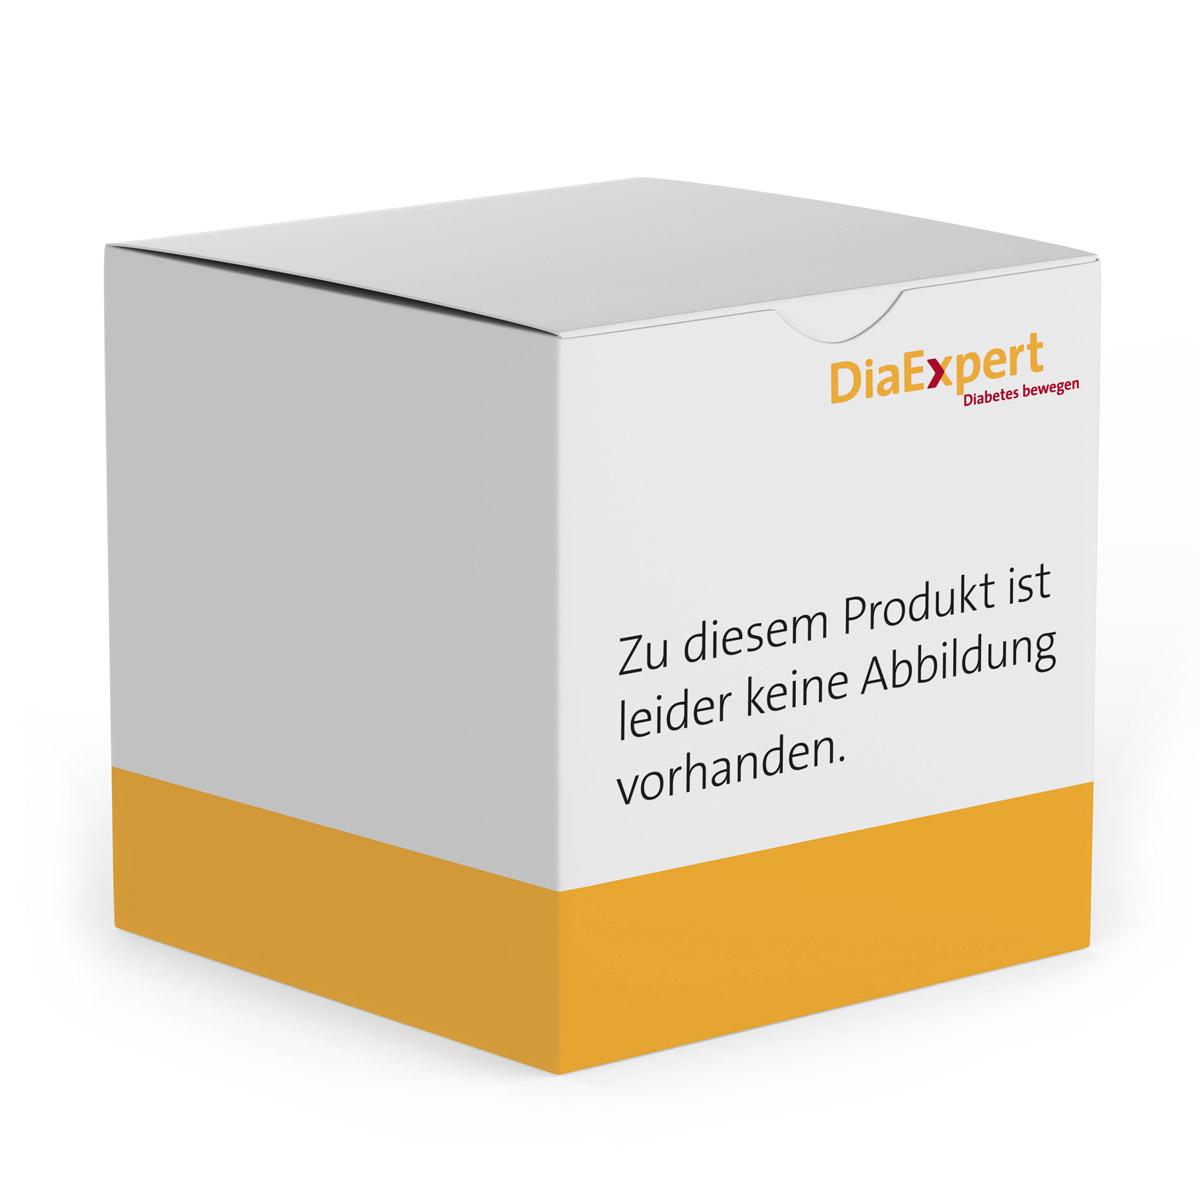 Diabetes Kette Edelstahl Maura 46-52 cm